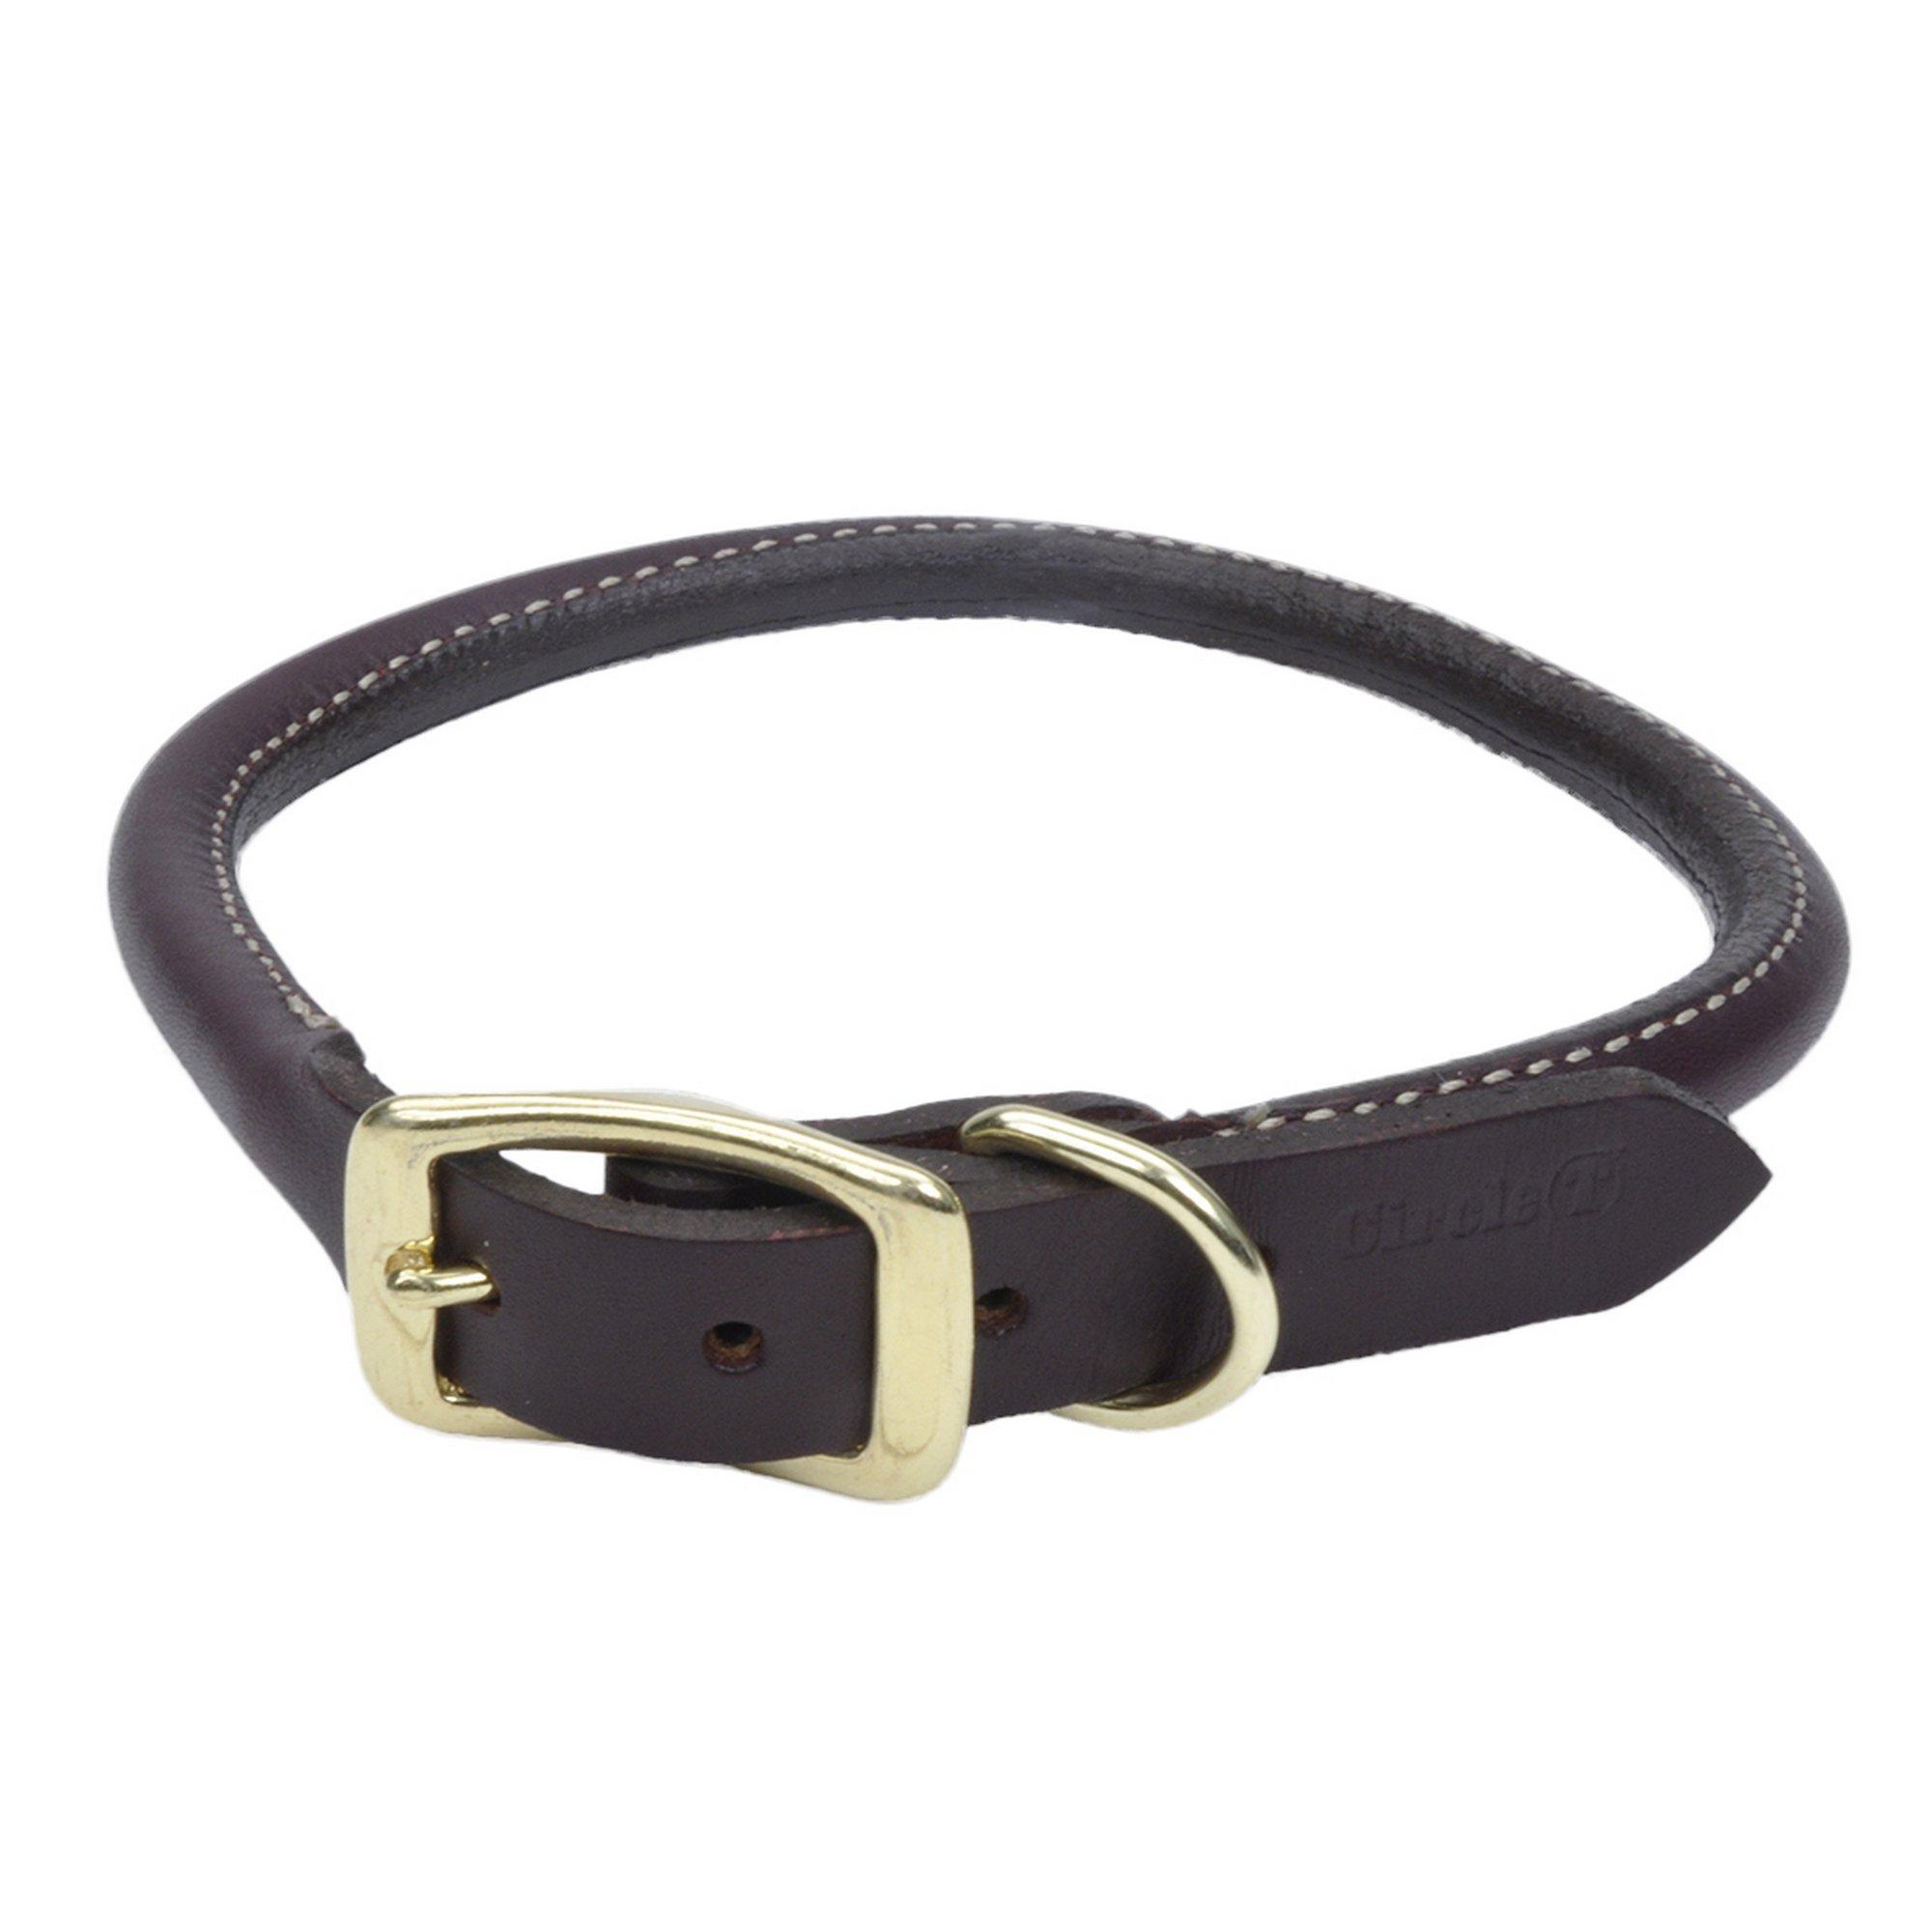 Coastal Pet Products Circle T Leather Round Dog Collar with Solid Brass Hardware, 3/4'' x 20'', Latigo